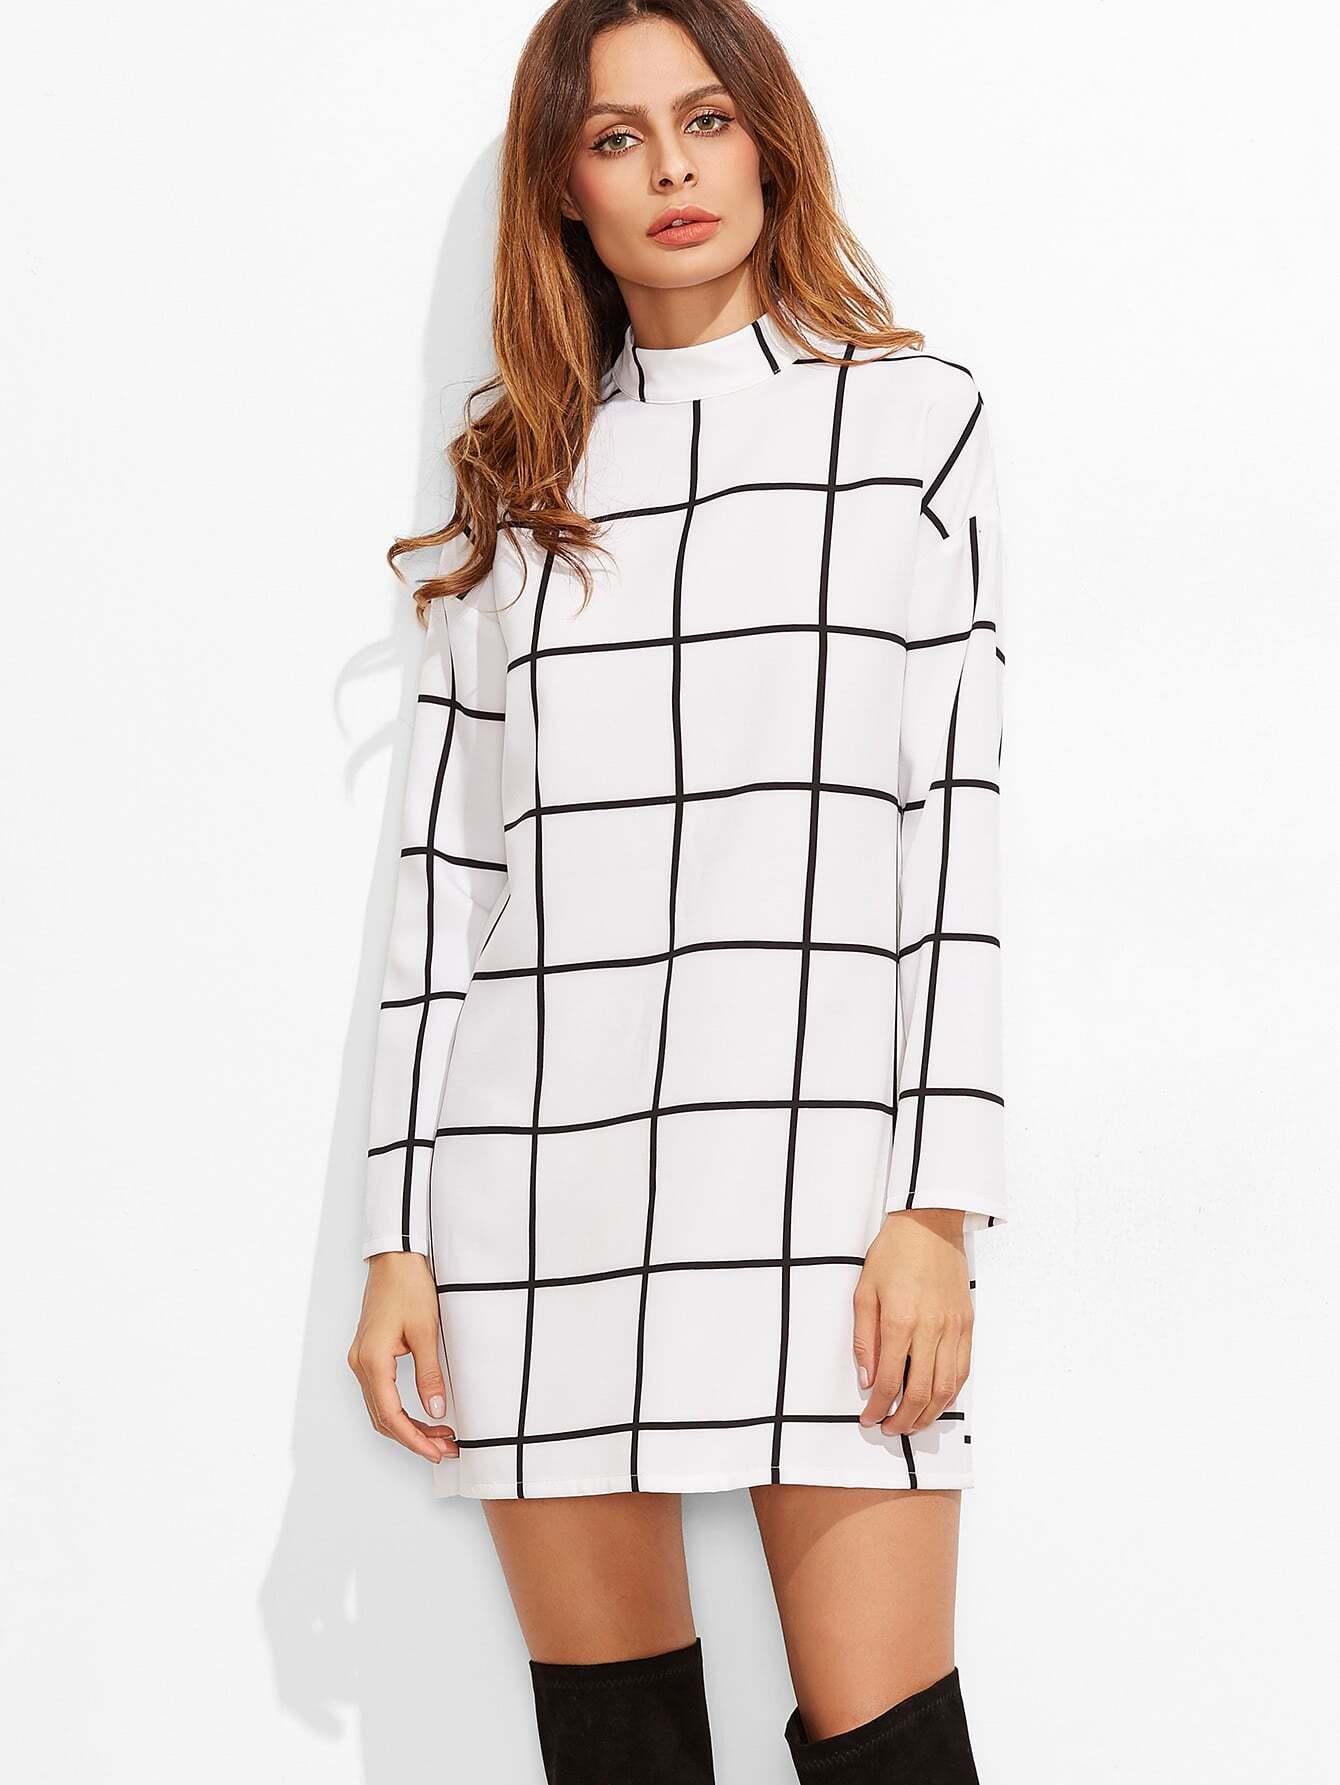 White Grid Mock Neck Tunic DressWhite Grid Mock Neck Tunic Dress<br><br>color: White<br>size: XS